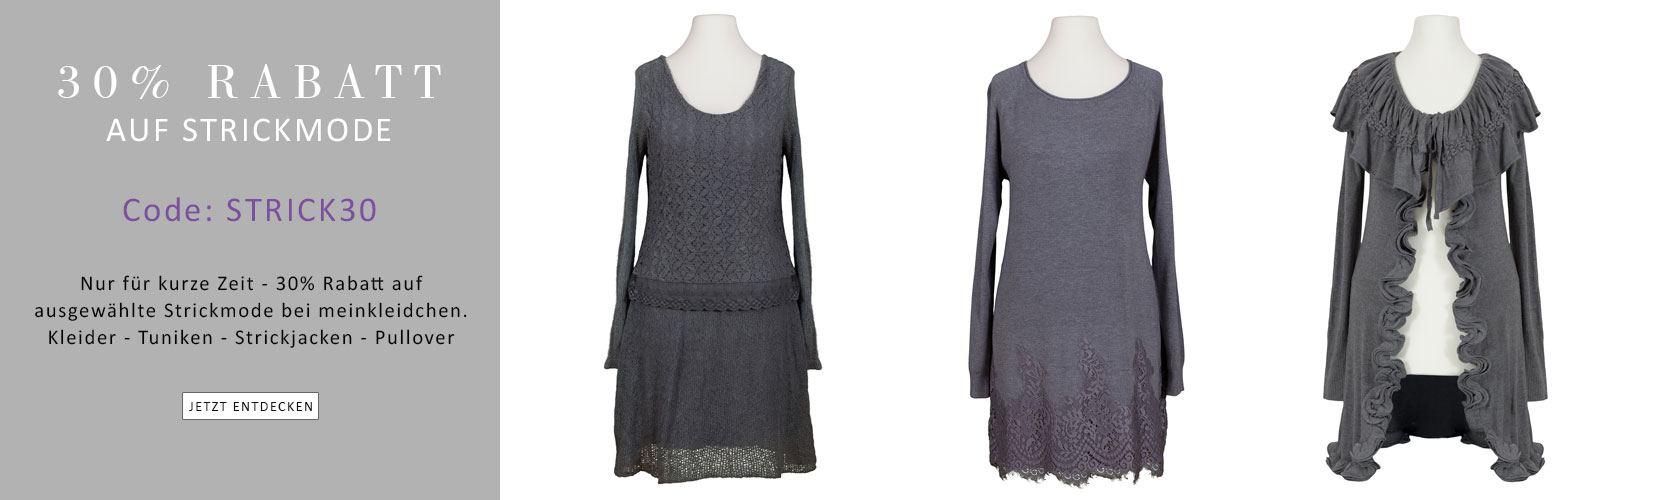 italienische damenmode online bestellen| meinkleidchen